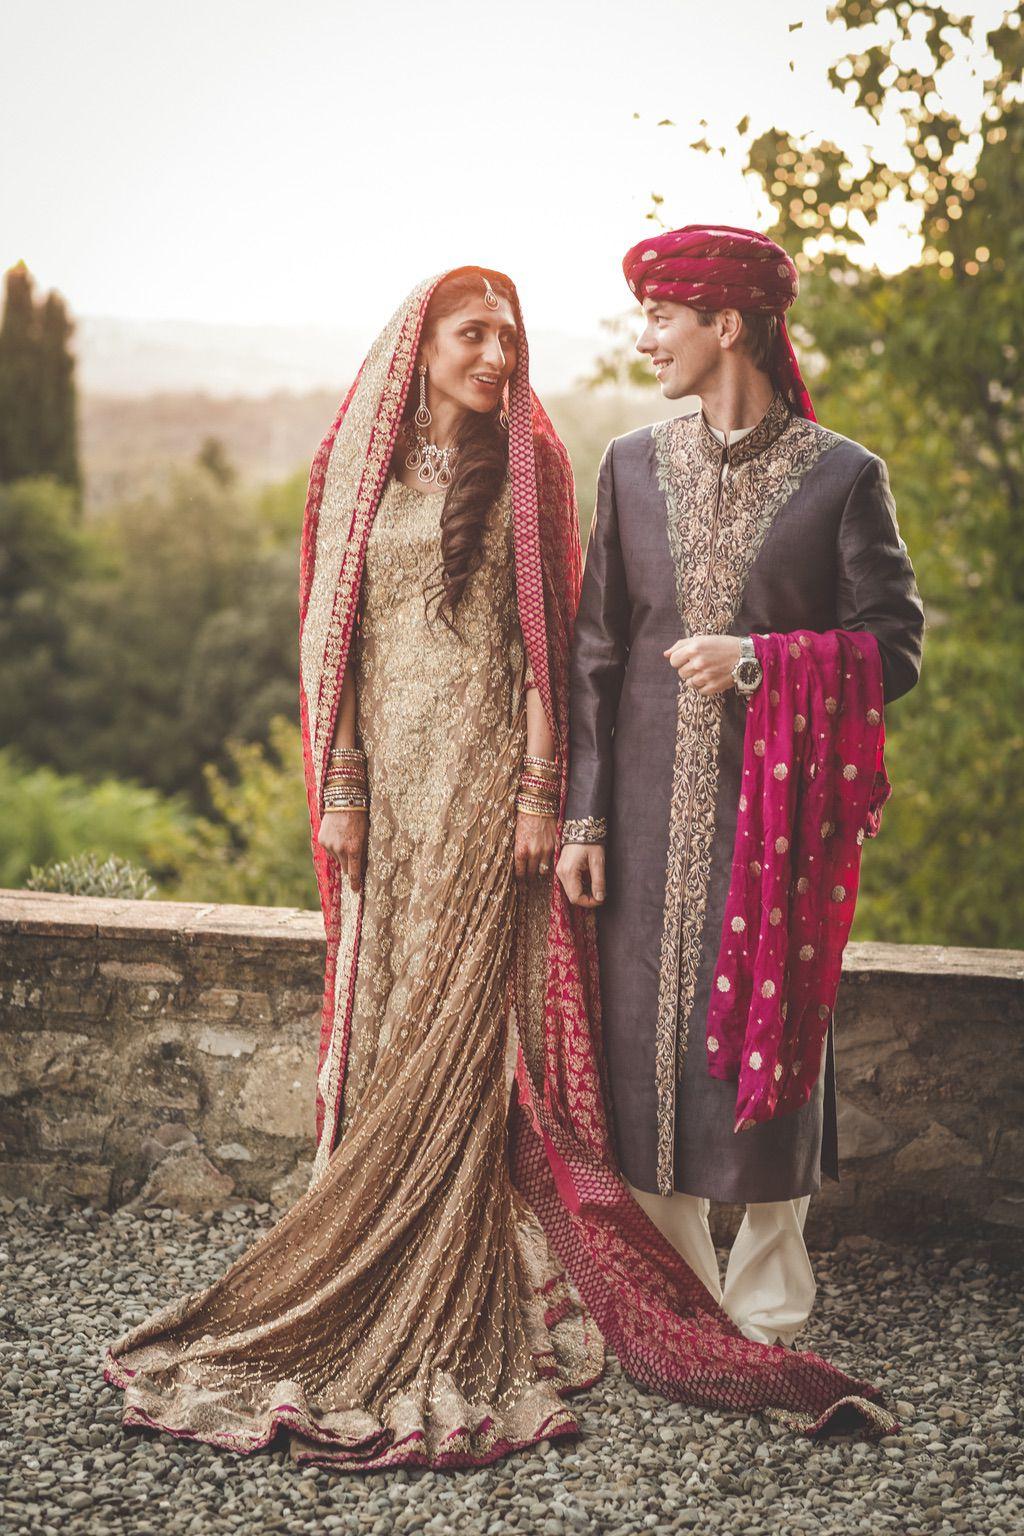 Sana-Safinaz-Pakistani-wedding-dress-villa-catignano-tuscany-081